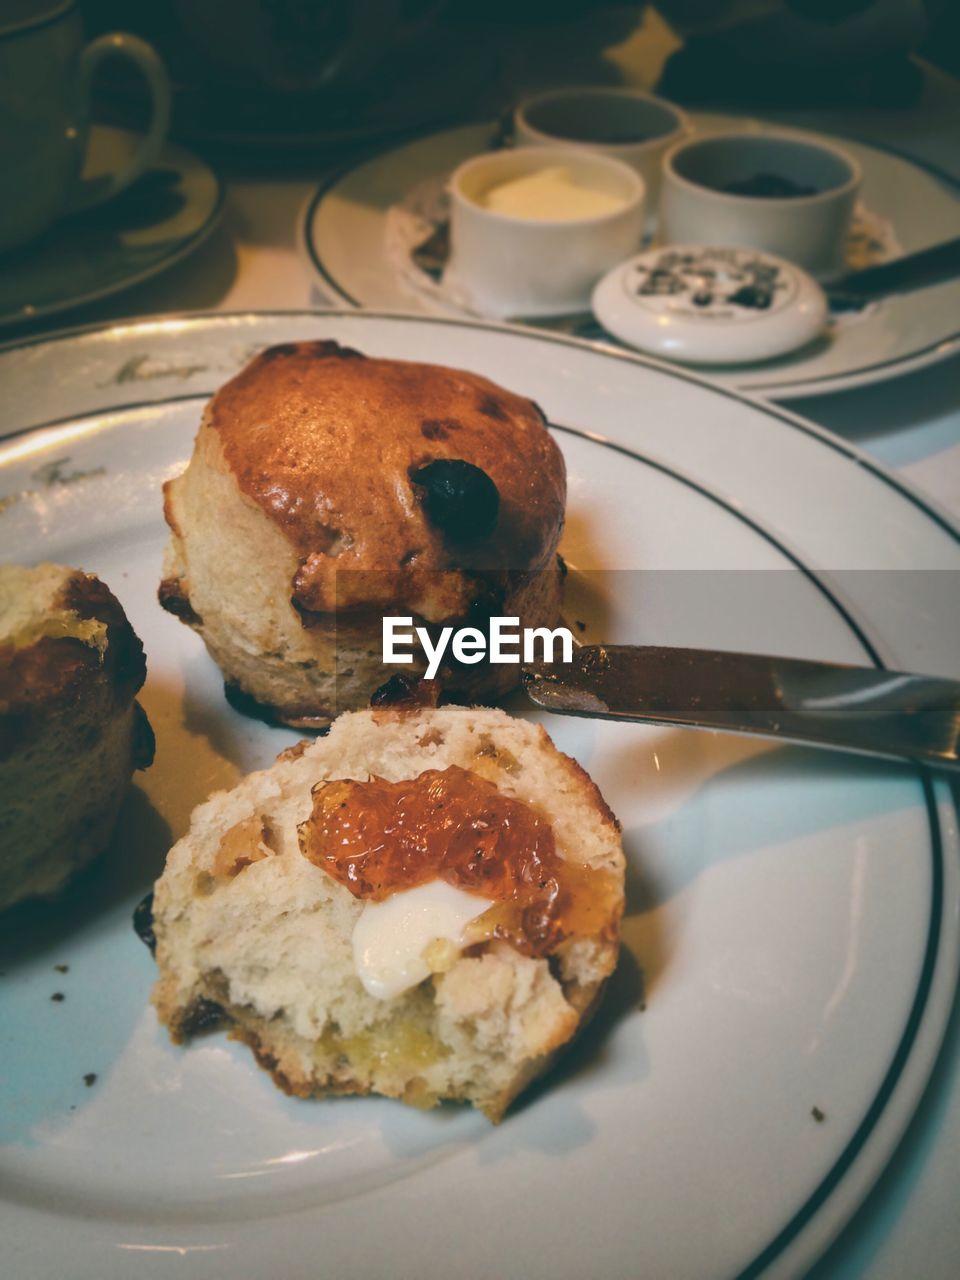 View Of Breakfast In Plate